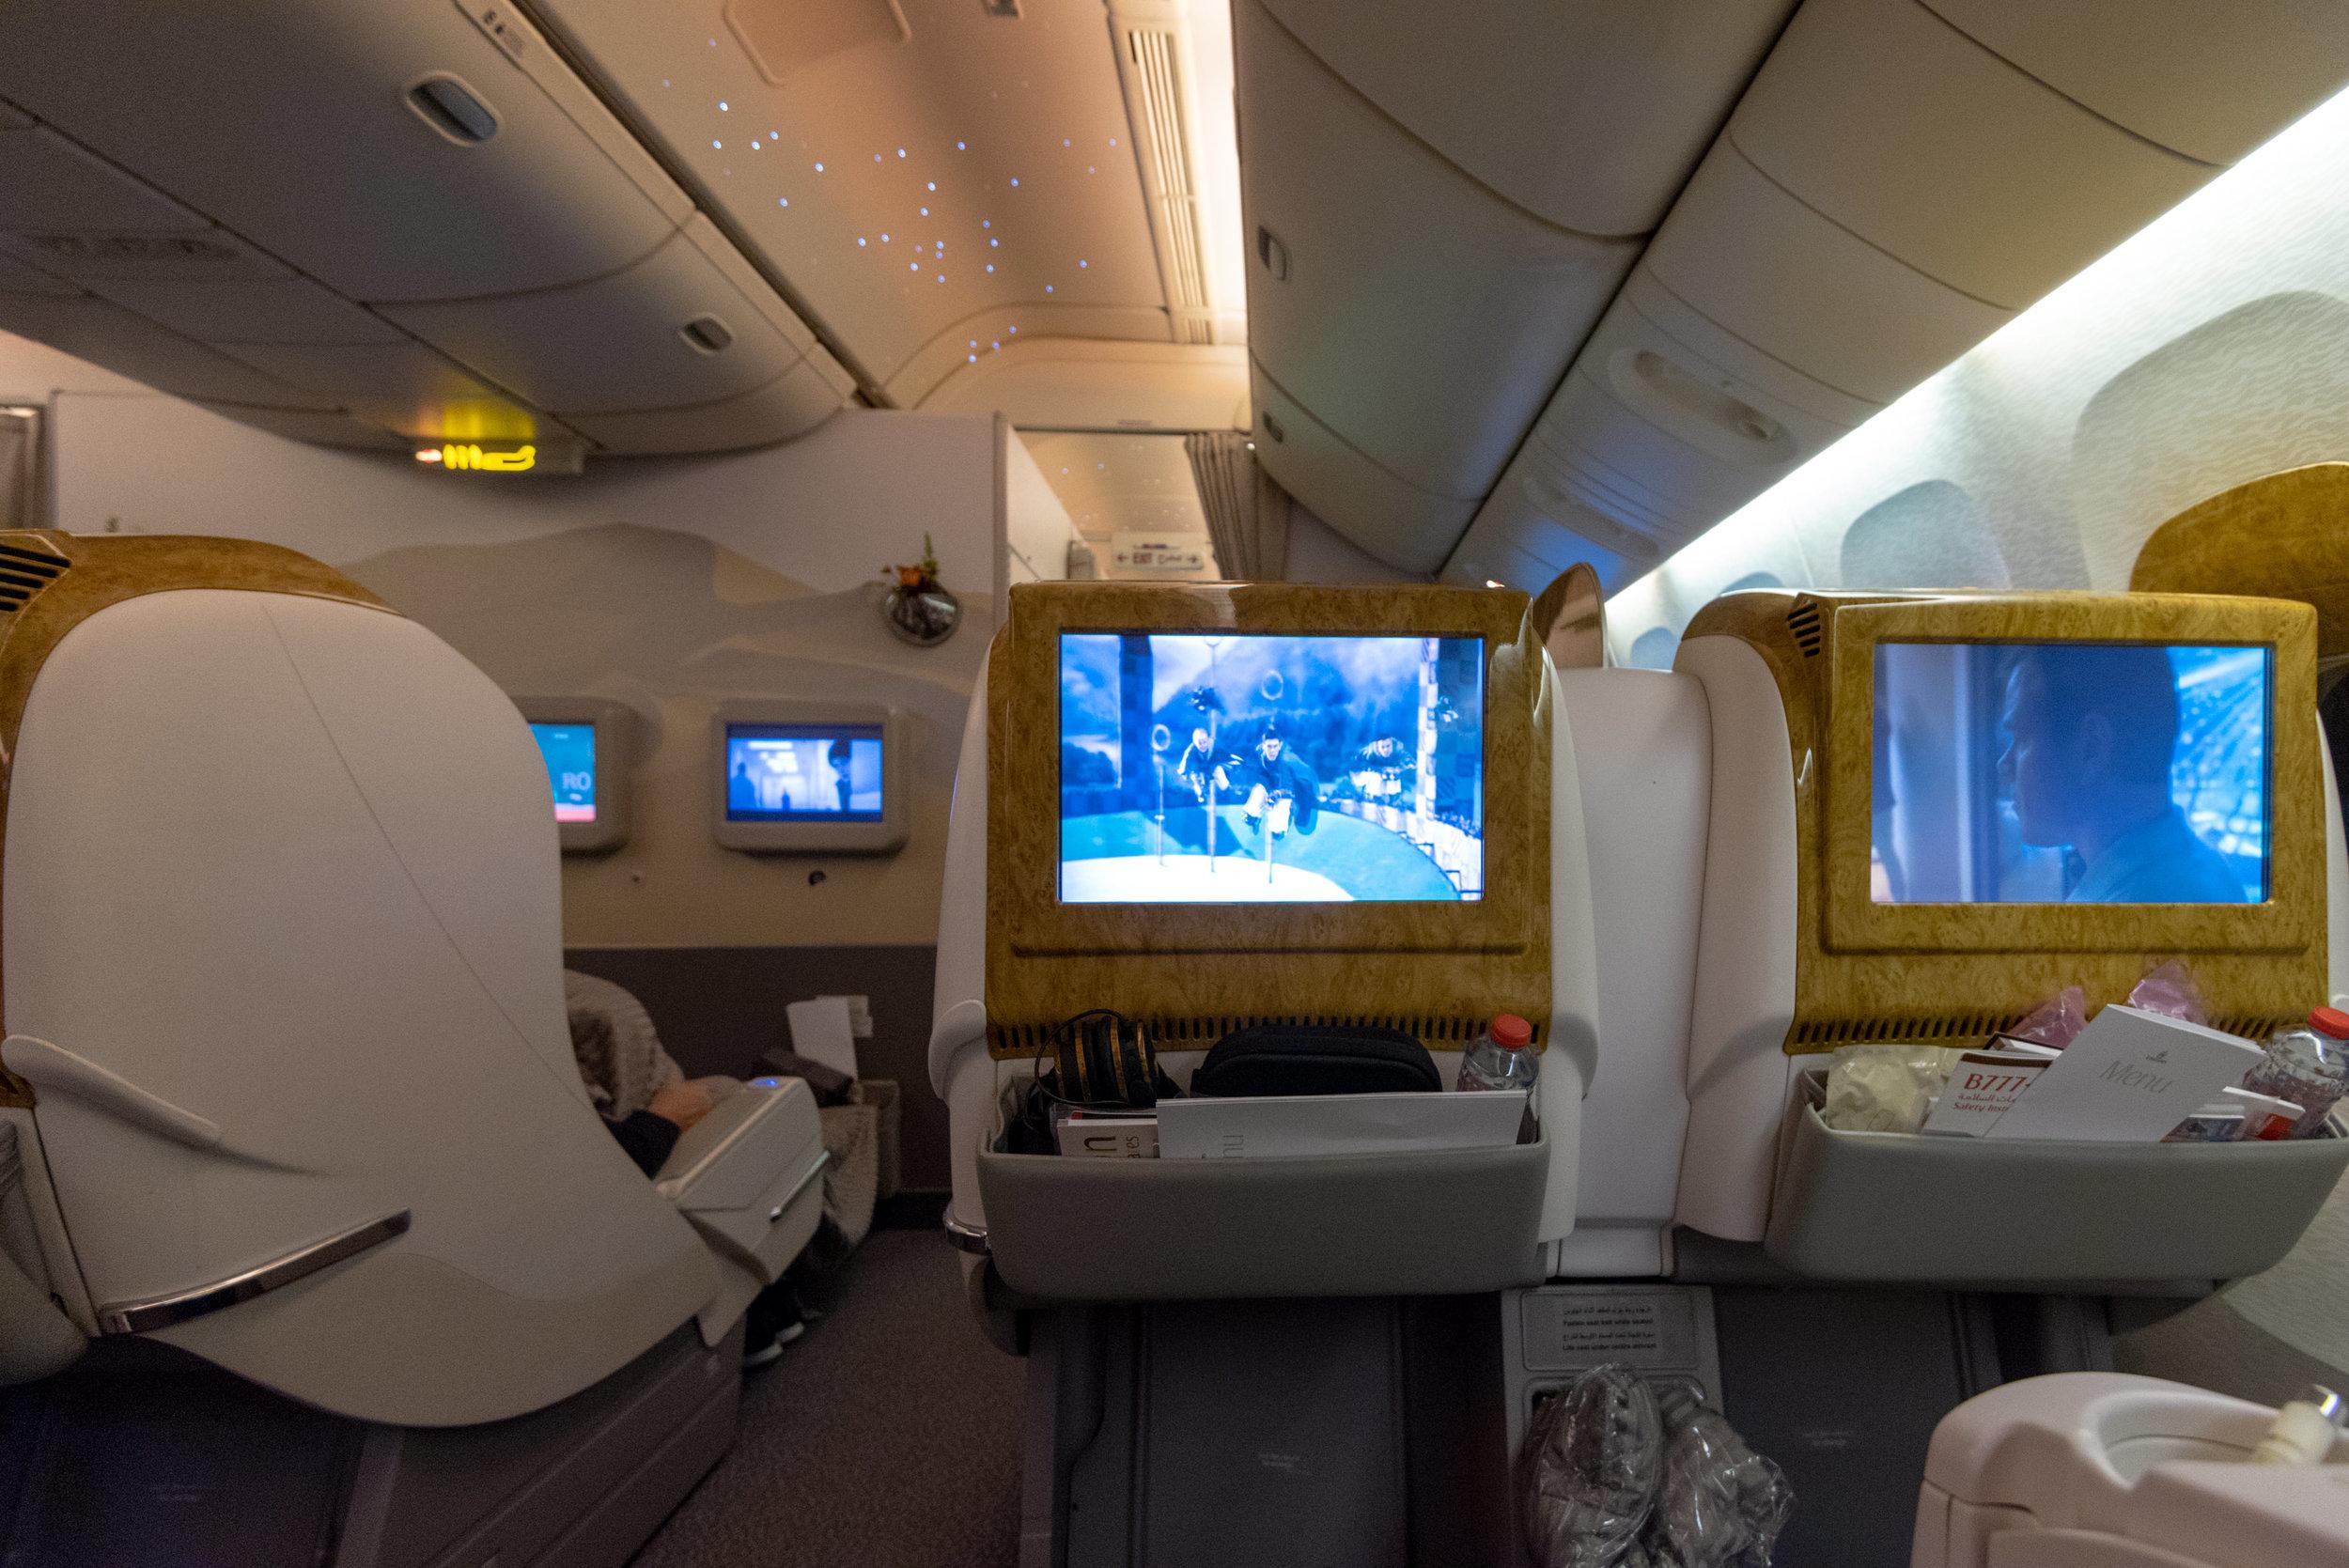 Business Class Cabin  Emirates EK352 Business Class 777-300ER - DXB to SIN